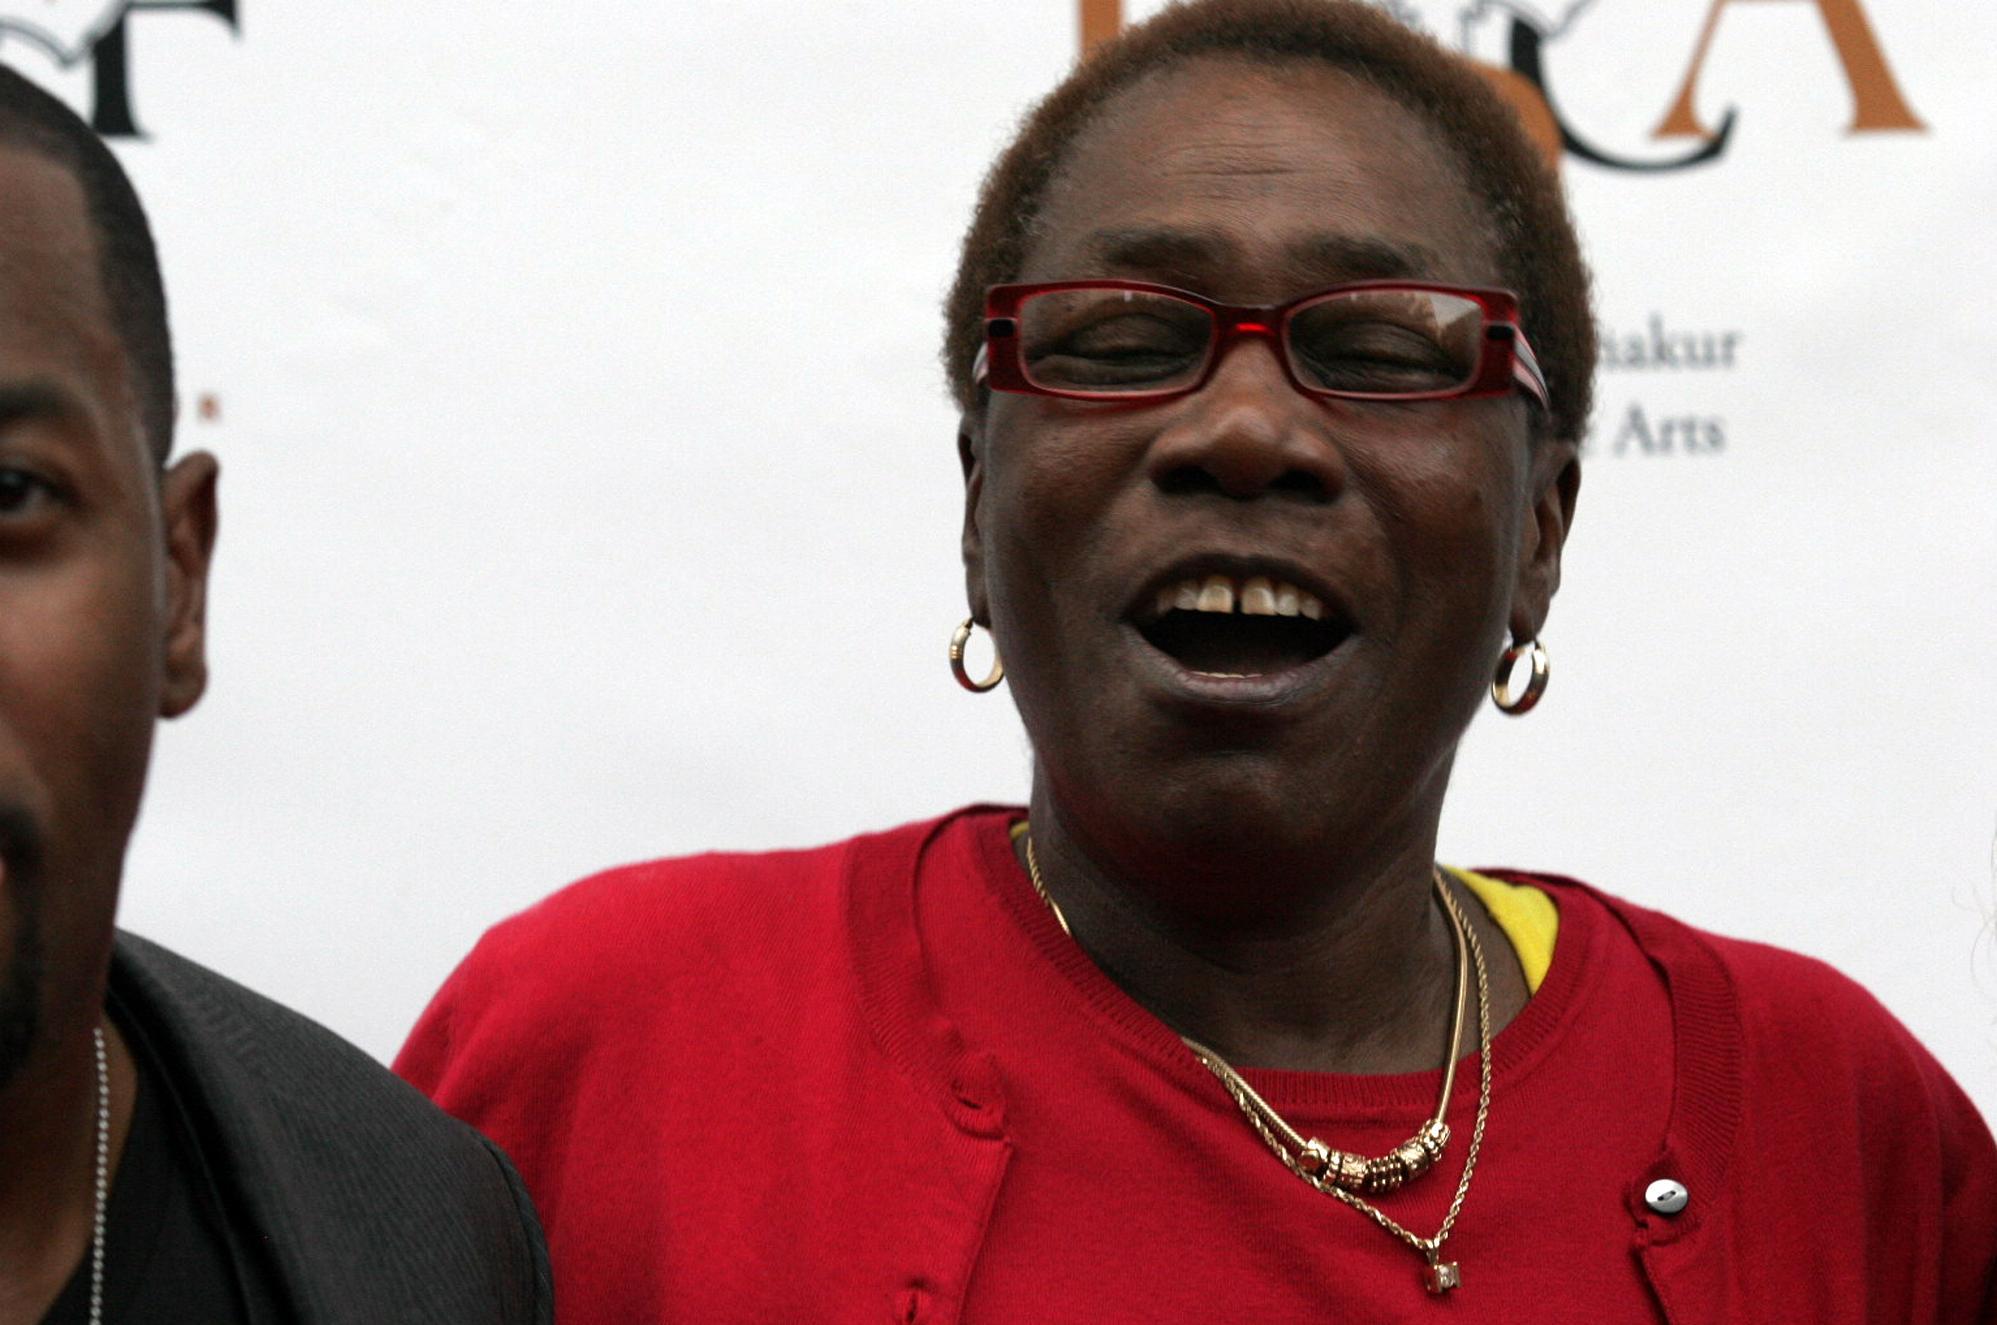 Afeni Shakur, mother of rapper Tupac Shakur, dies | The